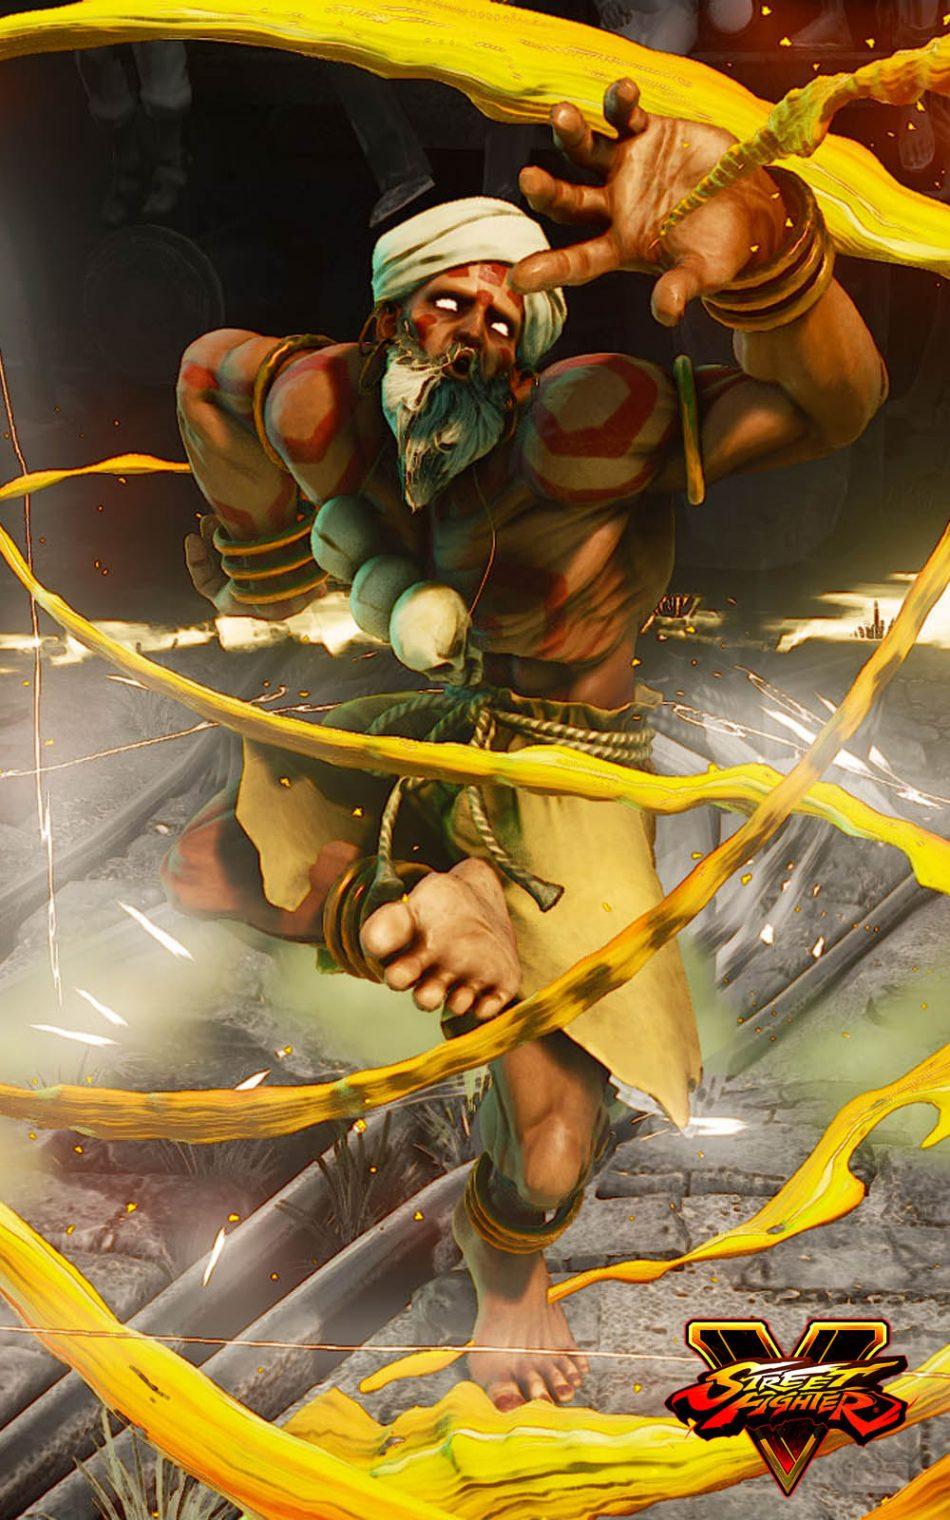 Dhalsim Street Fighter 5 Hero Free 4k Ultra Hd Mobile Wallpaper